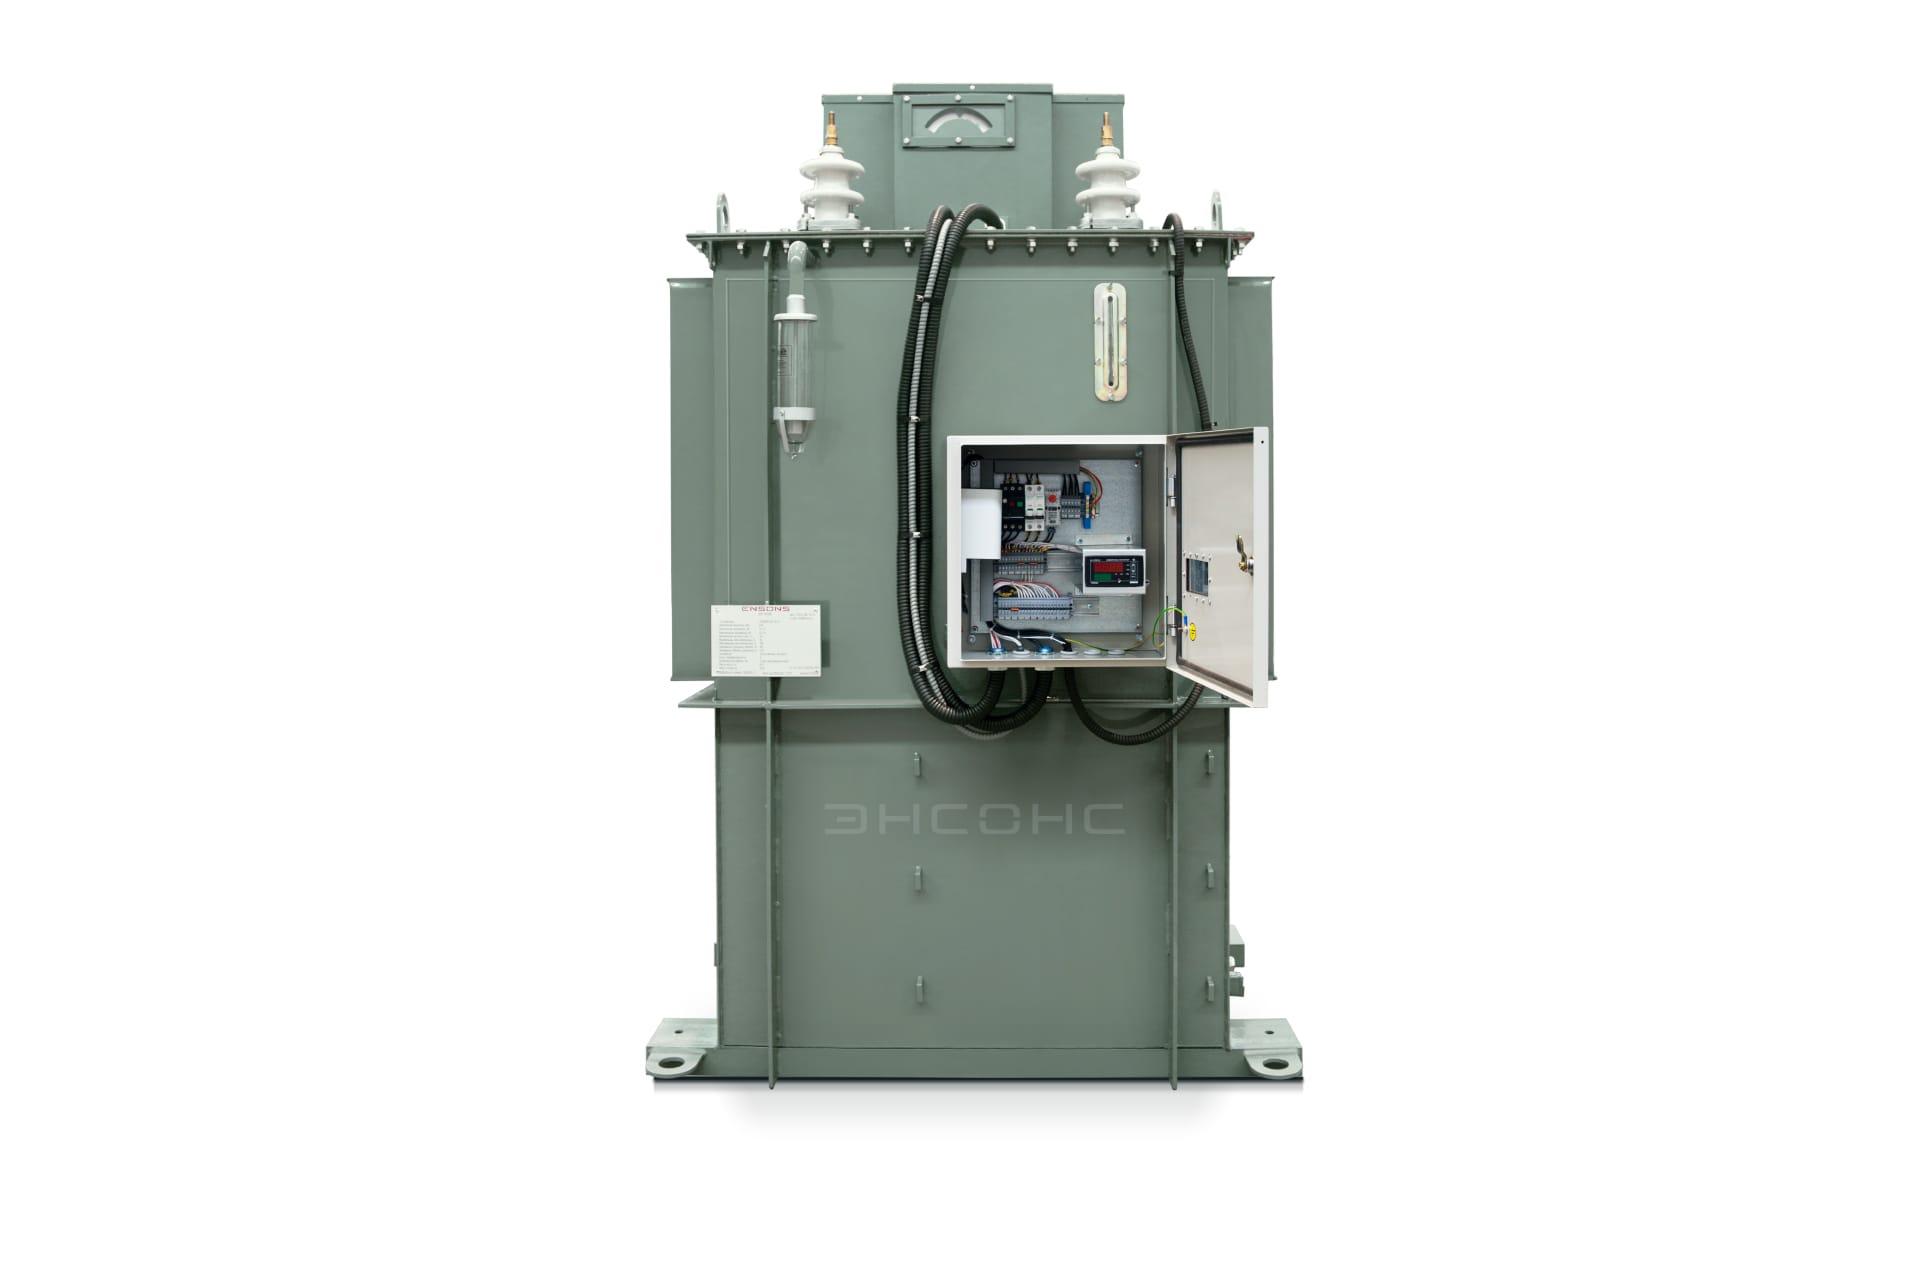 Токоограничивающий реактор — википедия с видео // wiki 2